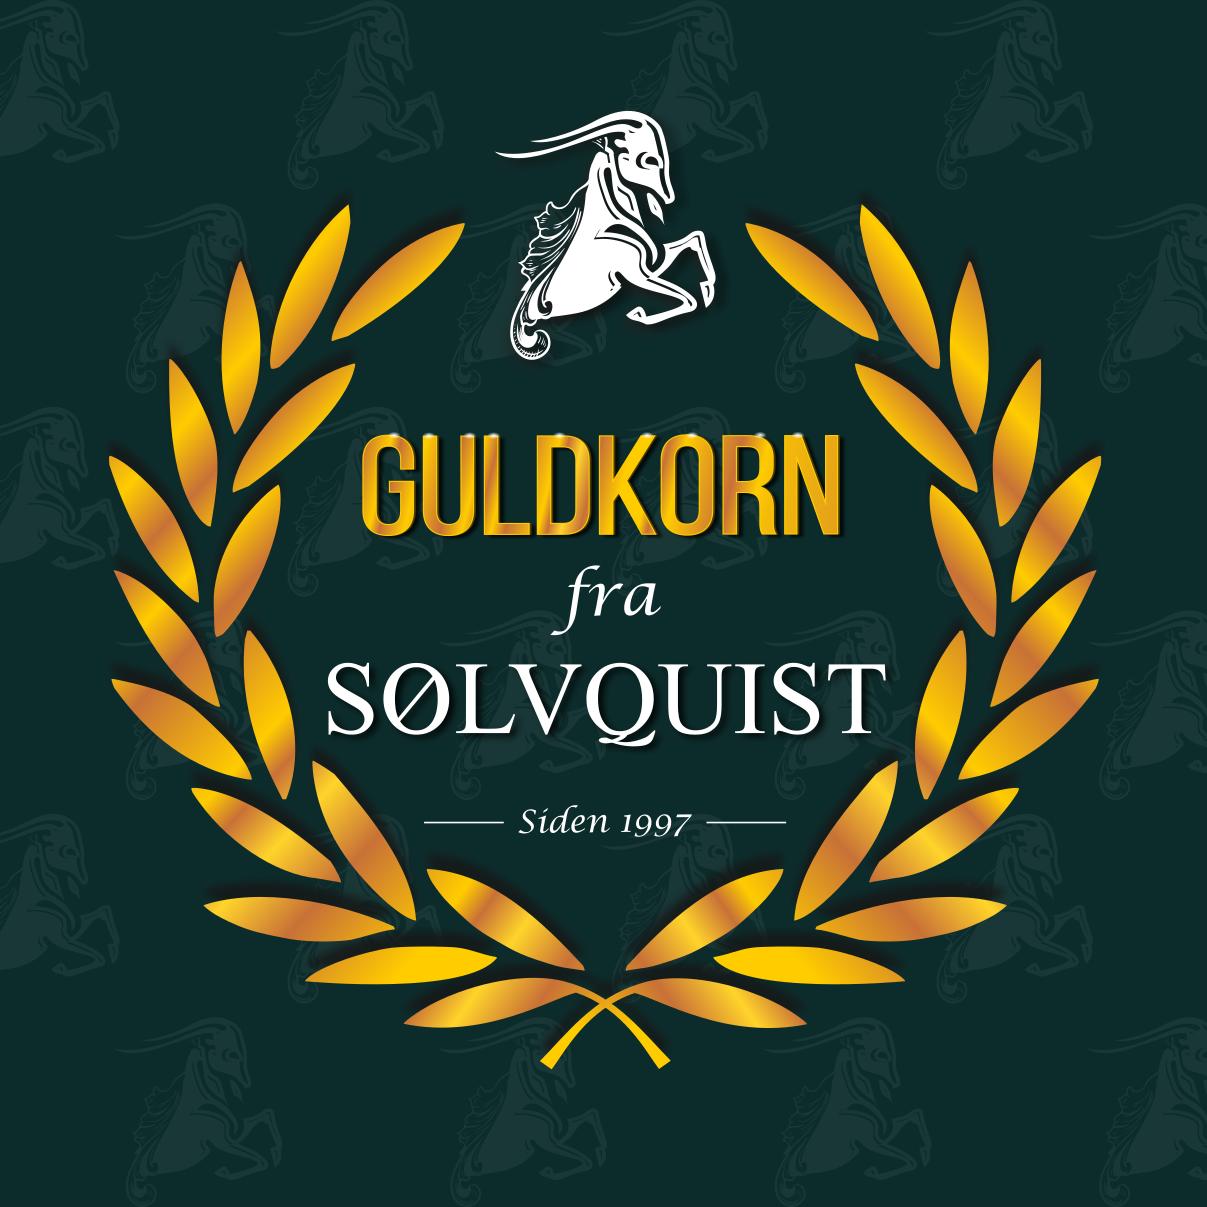 Guldkorn fra Sølvquist